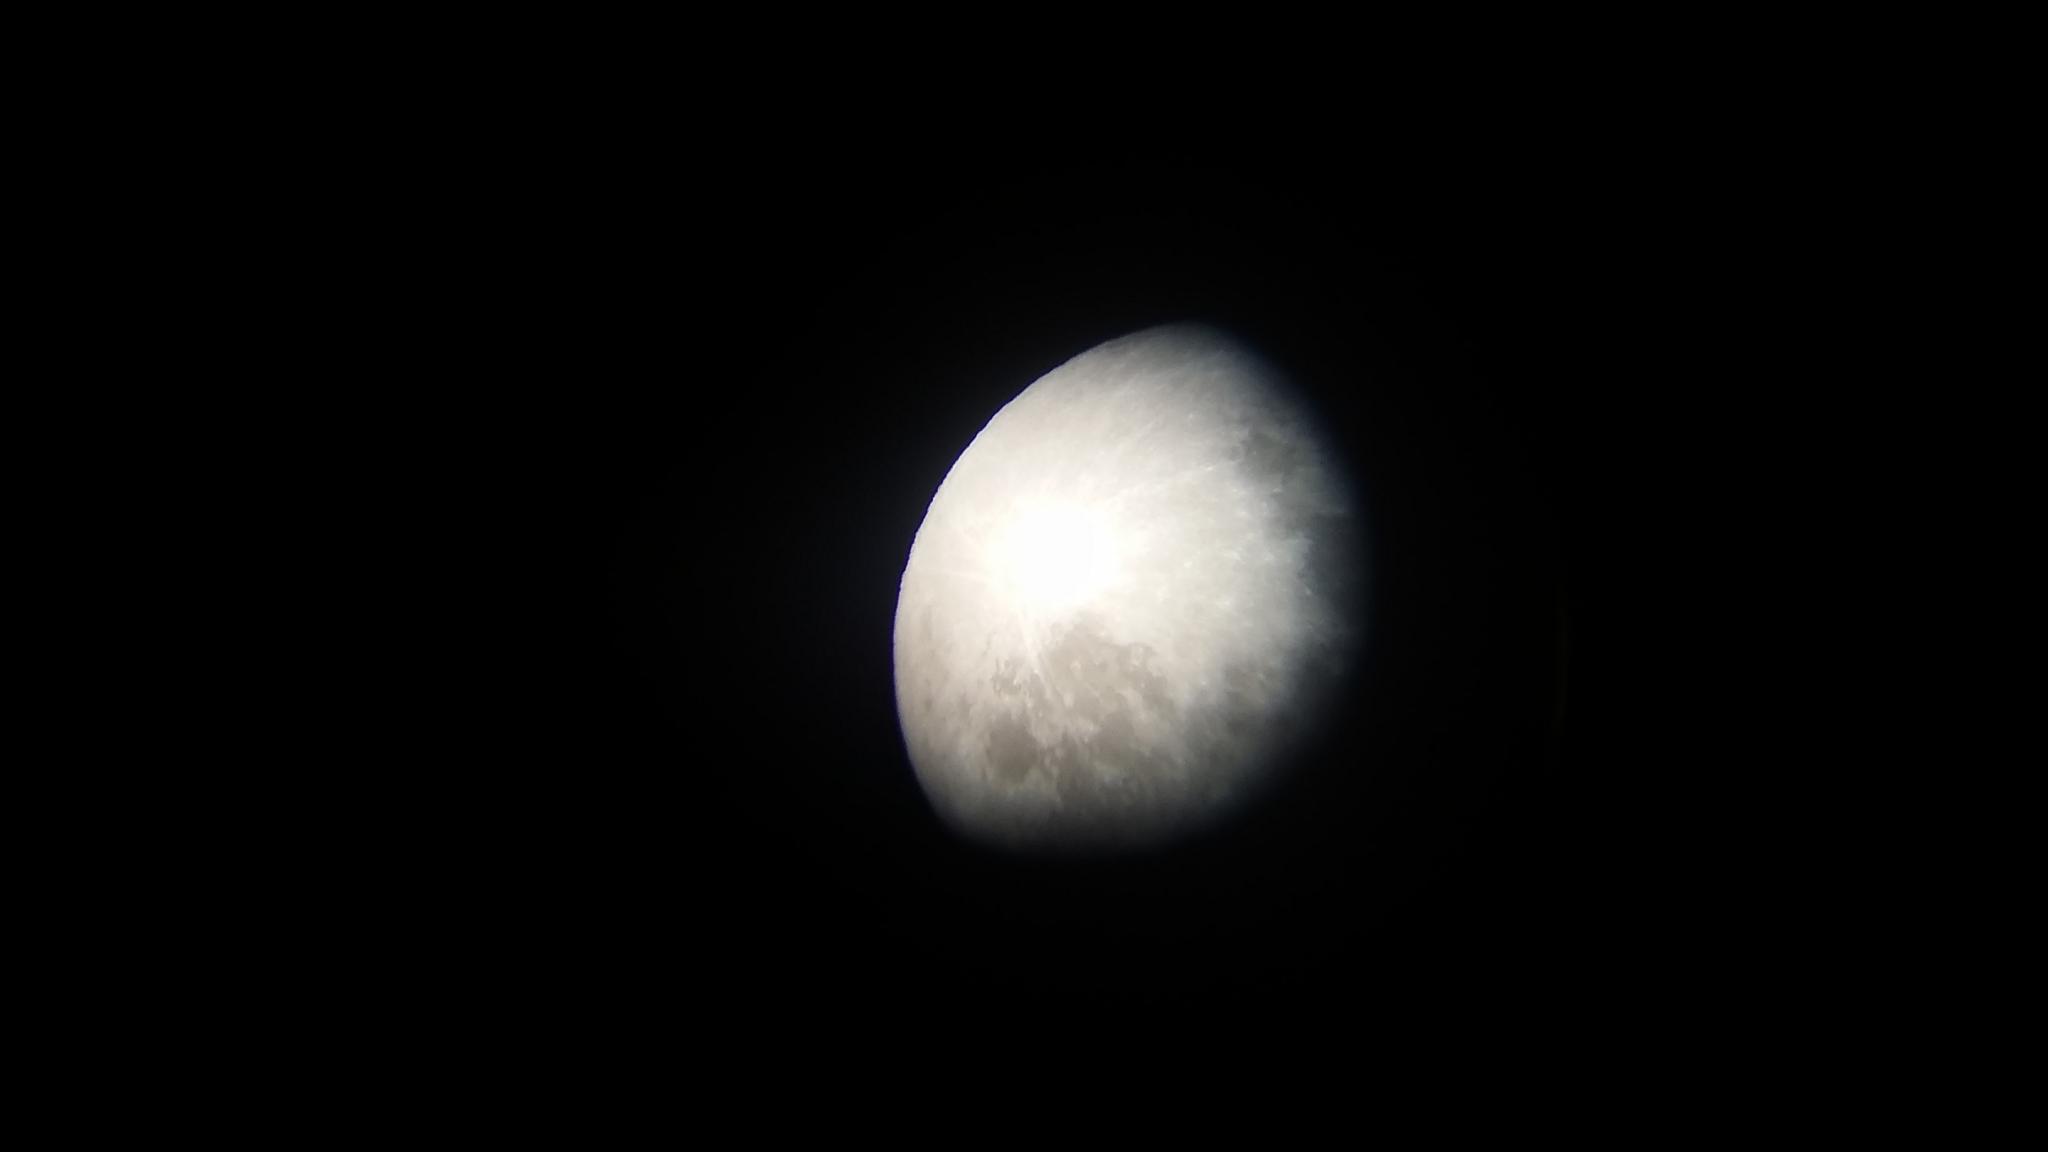 Recommend a telescope-20210526_182917-jpg